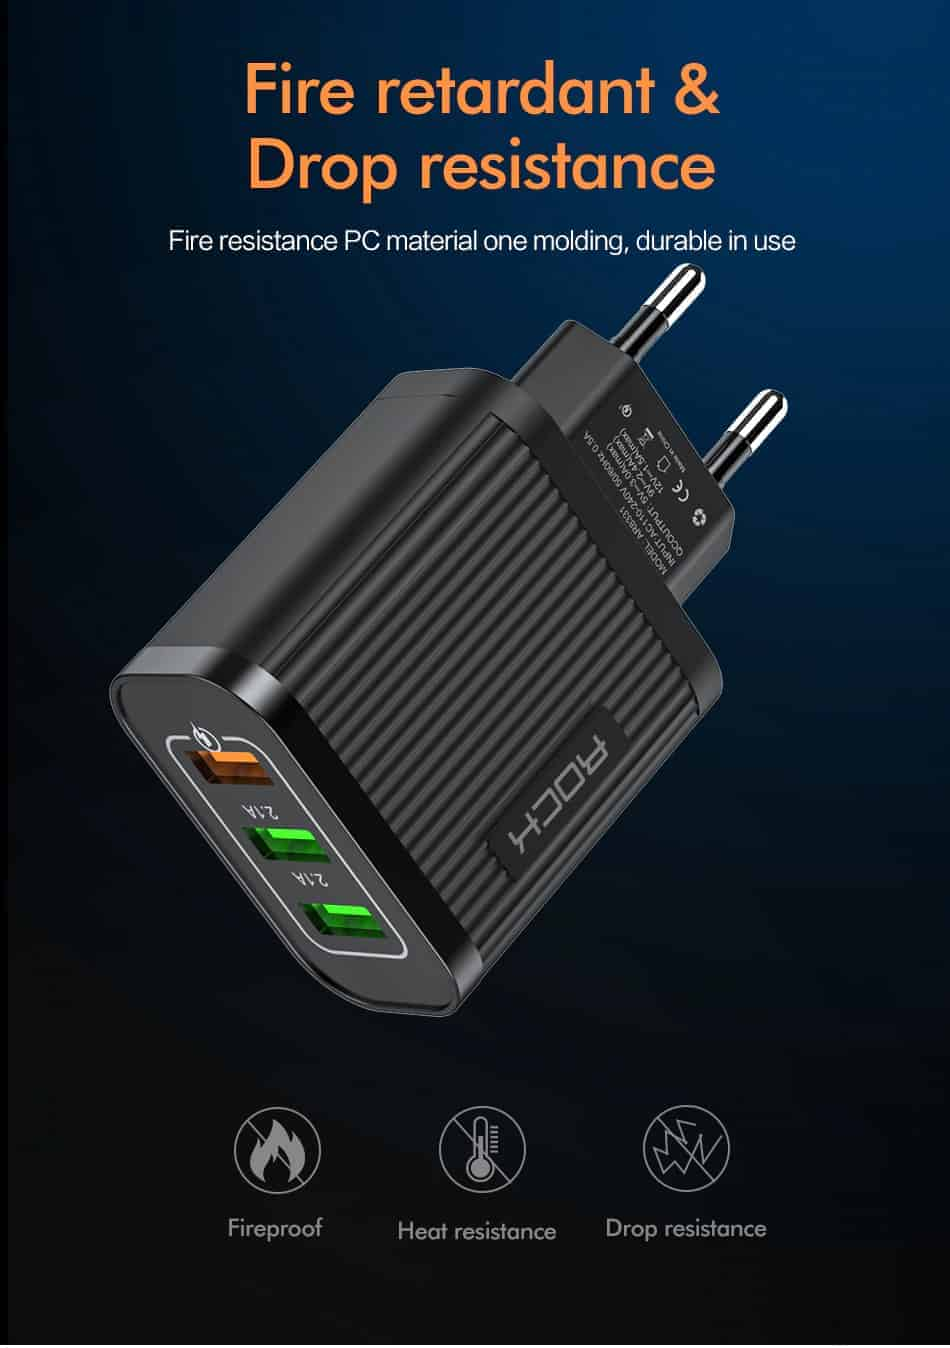 ROCK Quick Charger 3.0 3 USB Charger_Fire retardant Drop resistance